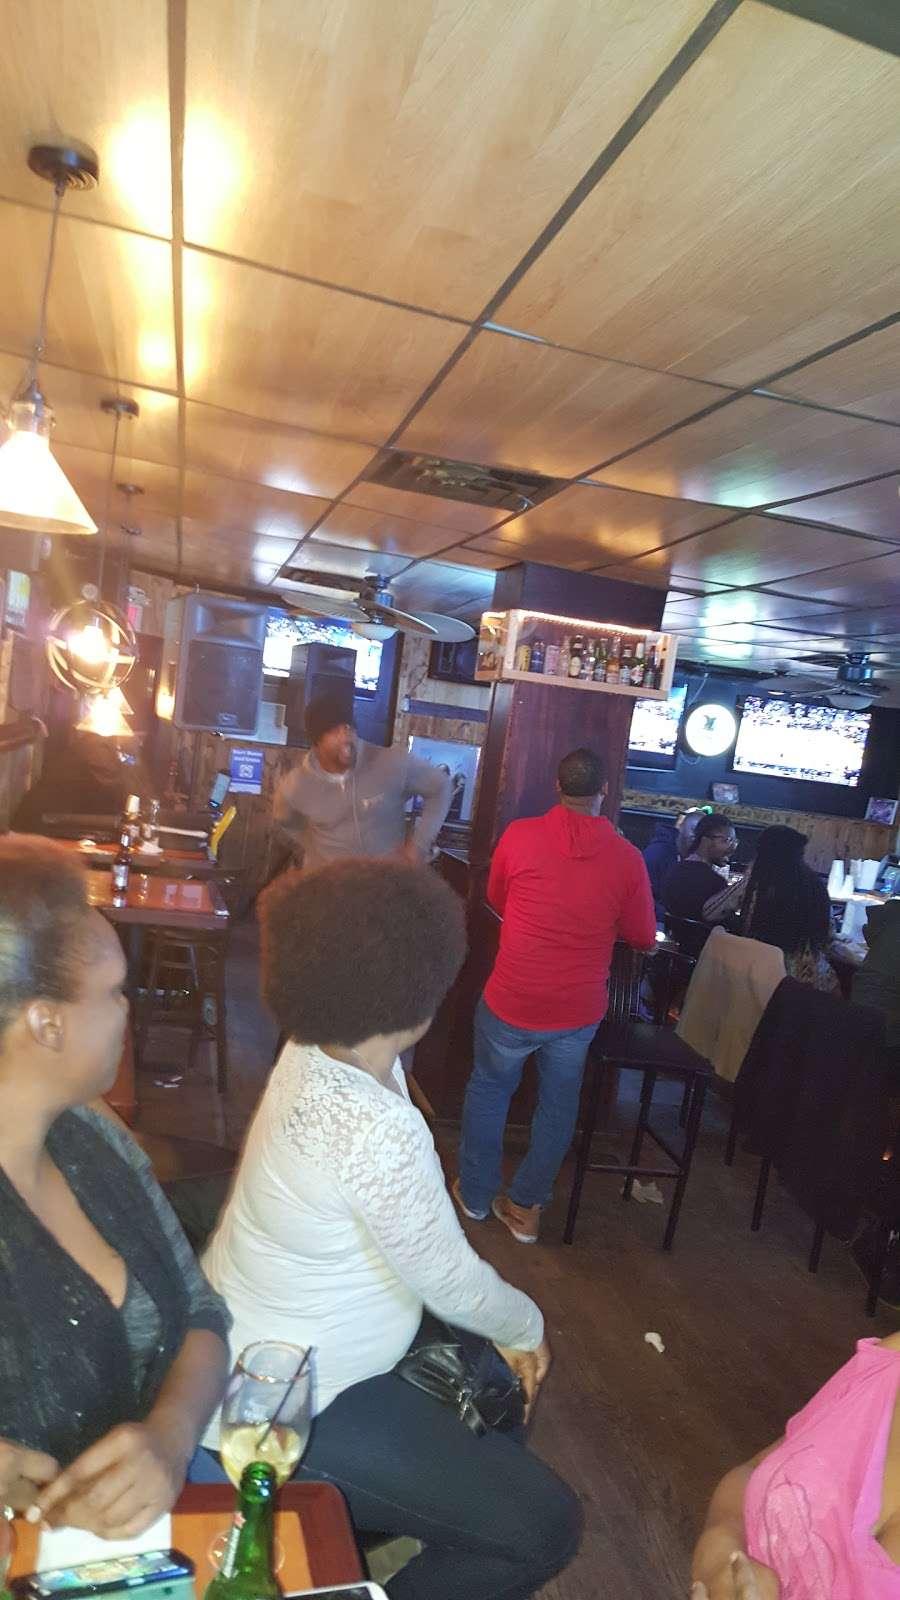 Lou & Choo Lounge - night club  | Photo 6 of 10 | Address: 2101 W Hunting Park Ave, Philadelphia, PA 19140, USA | Phone: (215) 228-7281